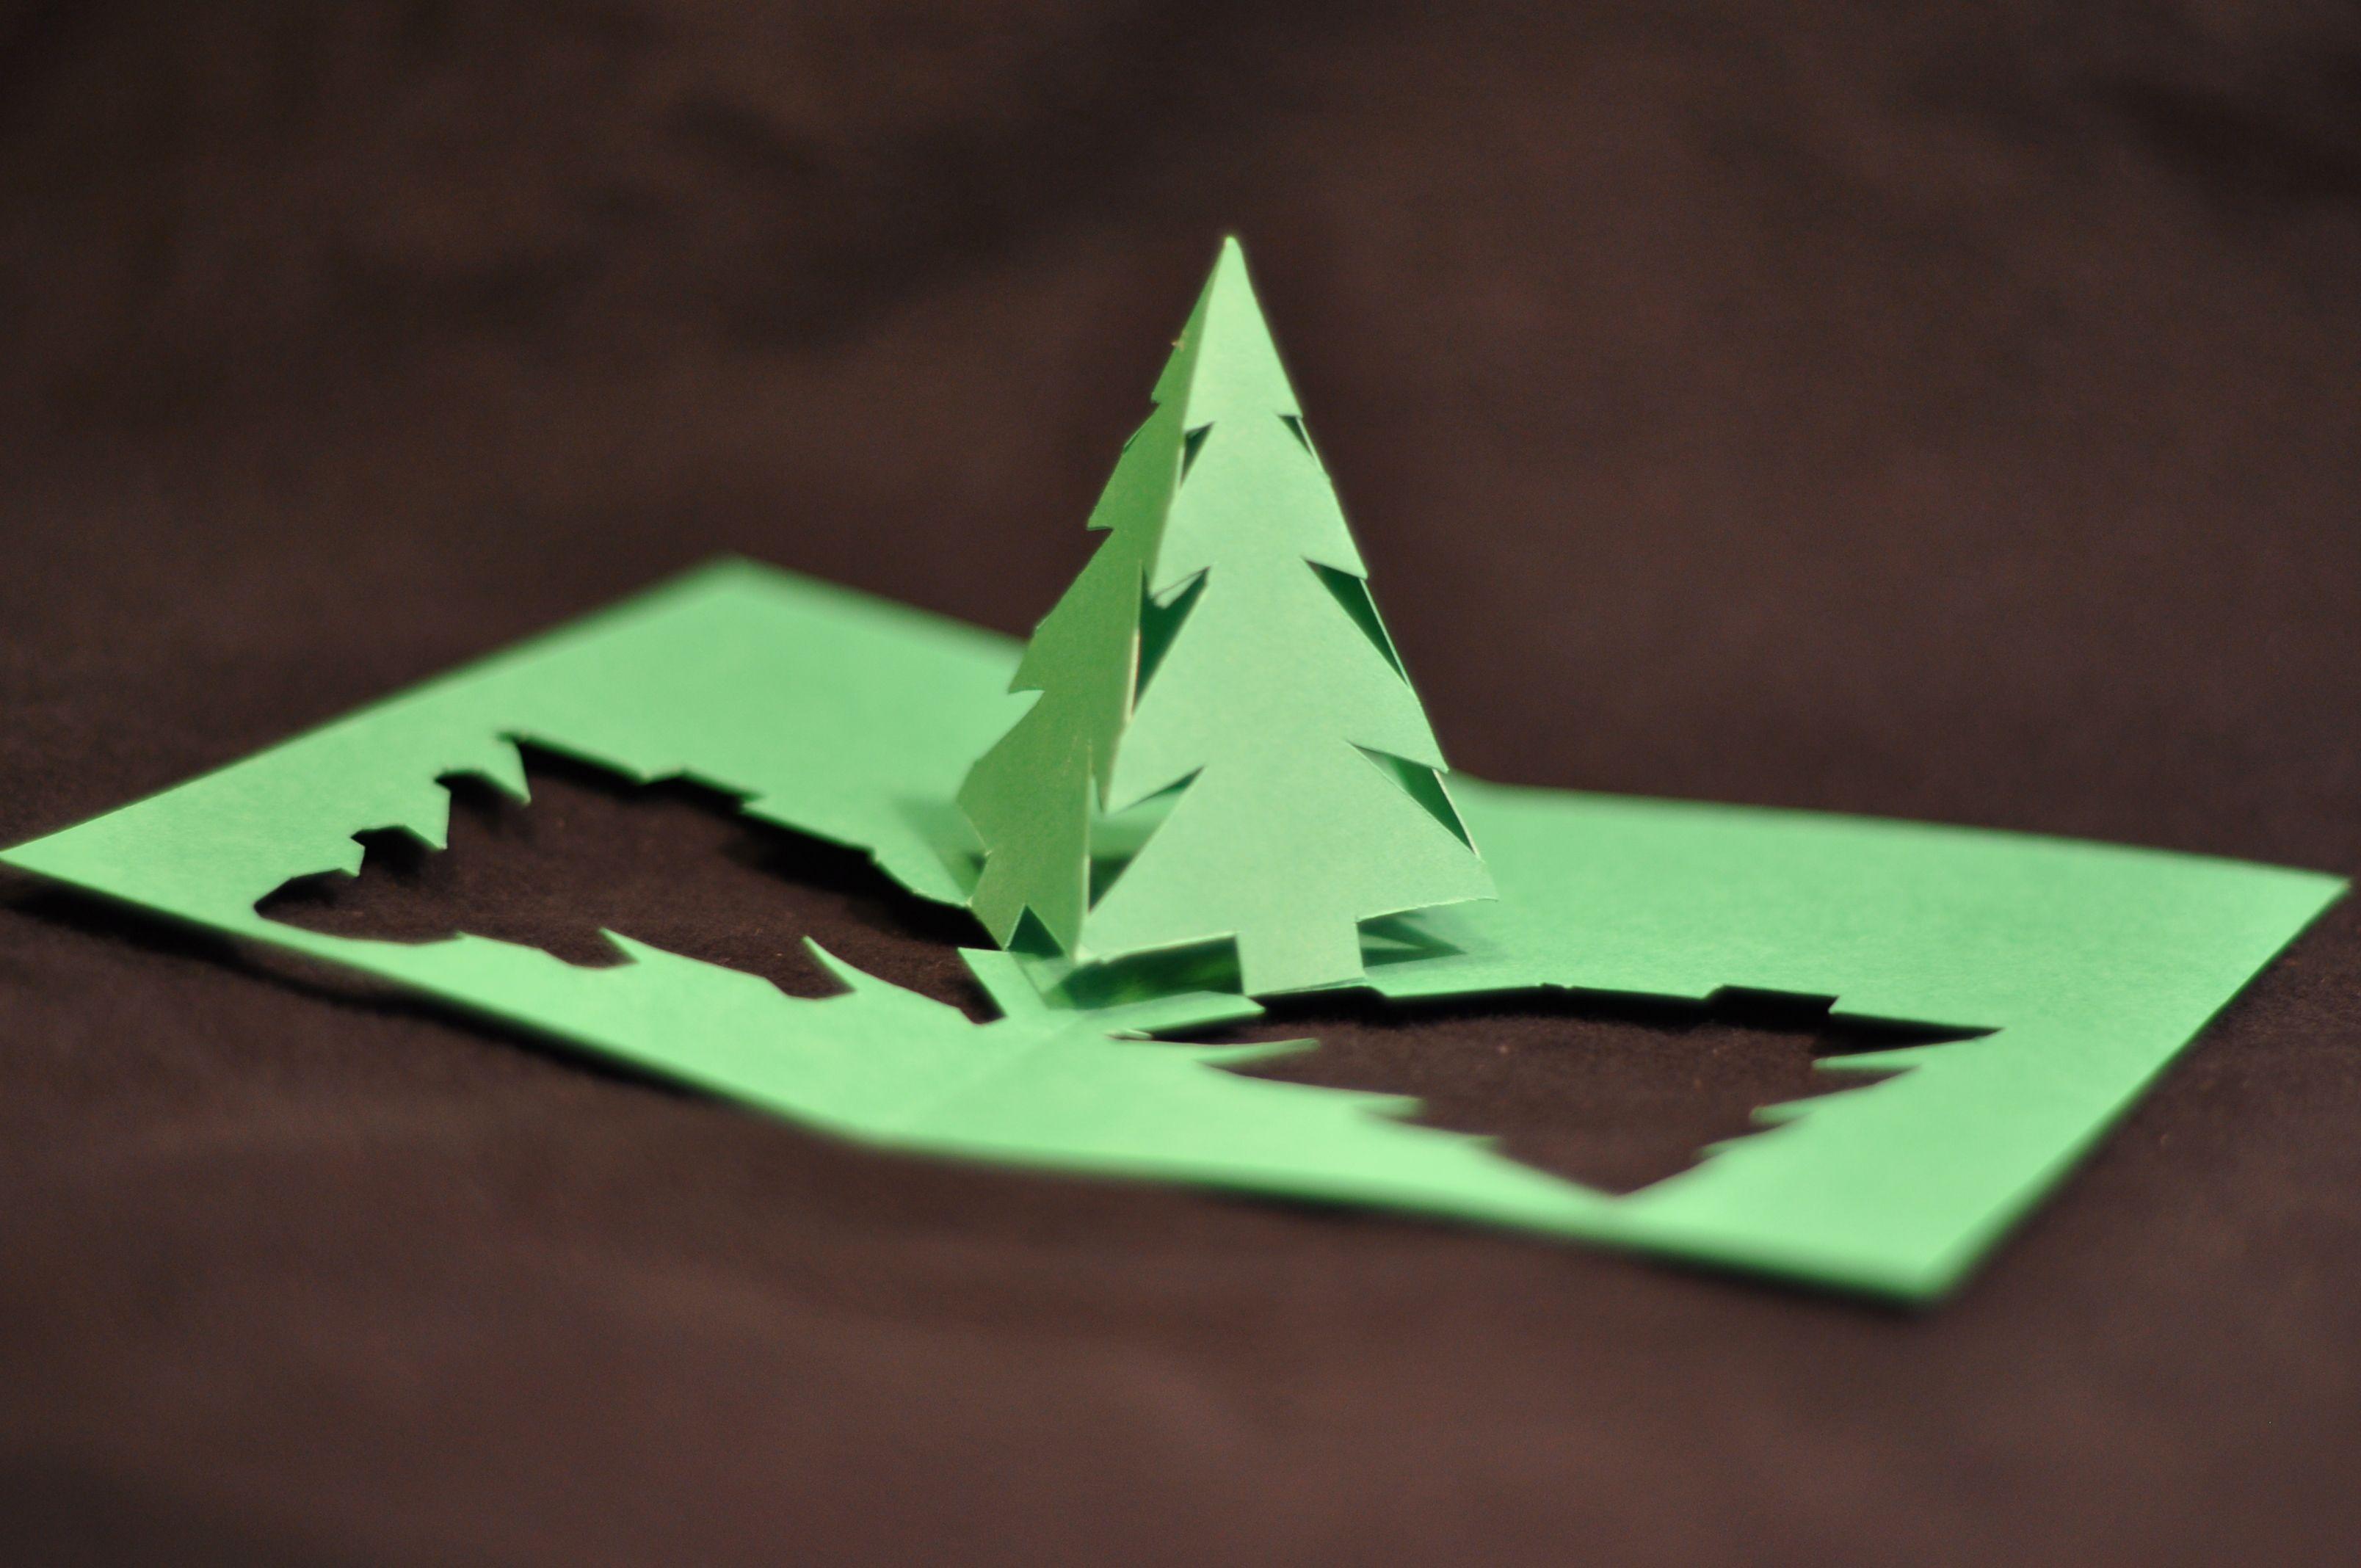 Christmas Tree Template Pop Up Christmas Cards Pop Up Cards Christmas Tree Cards